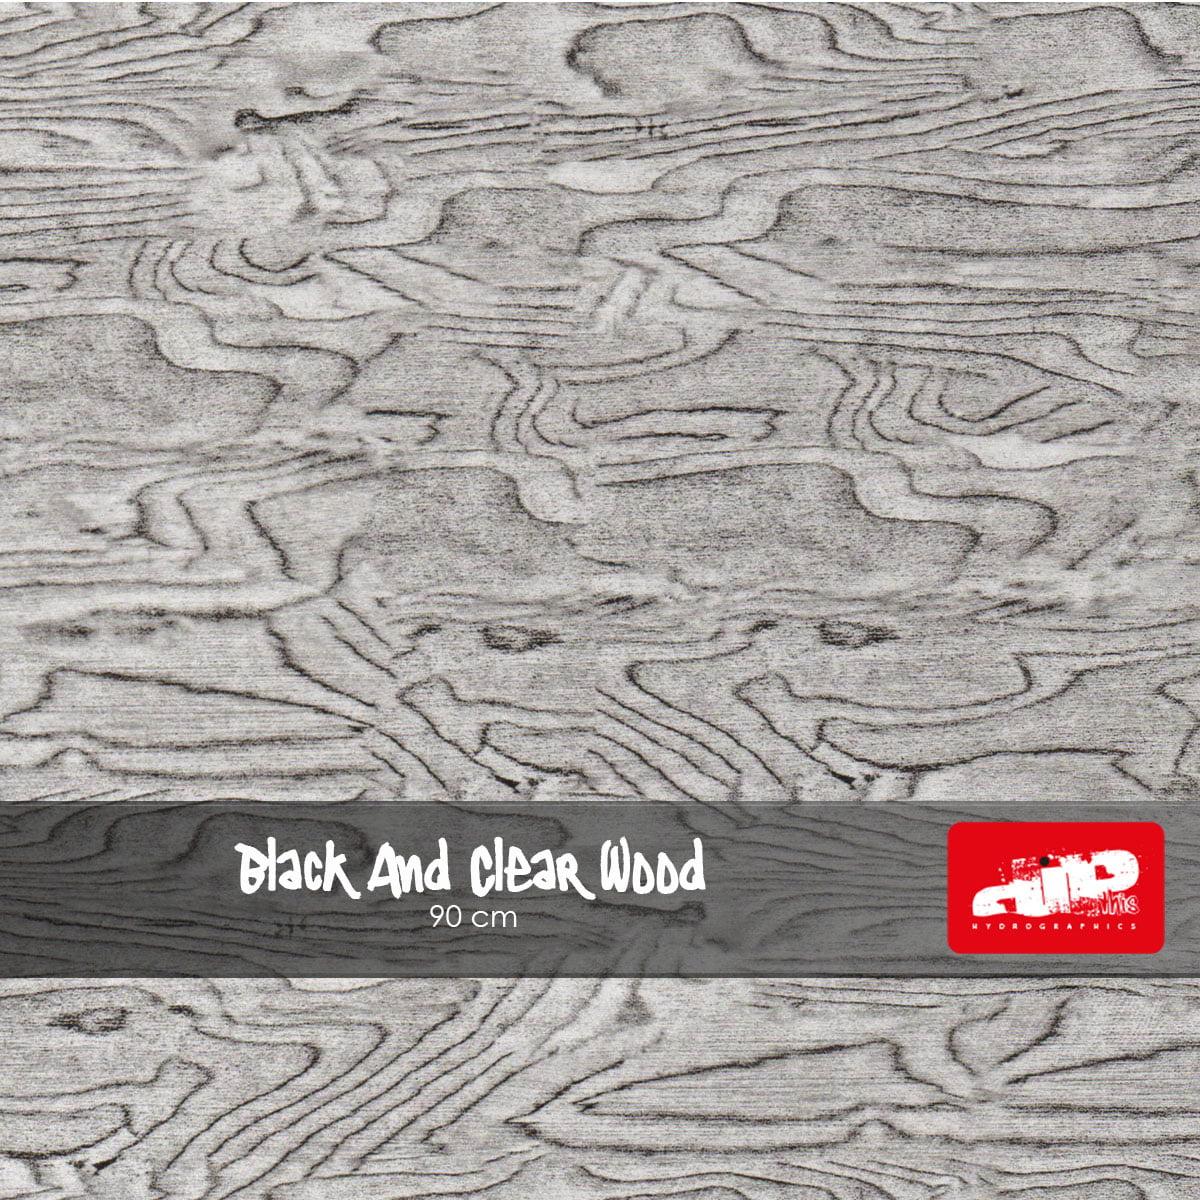 Black & Clear Wood